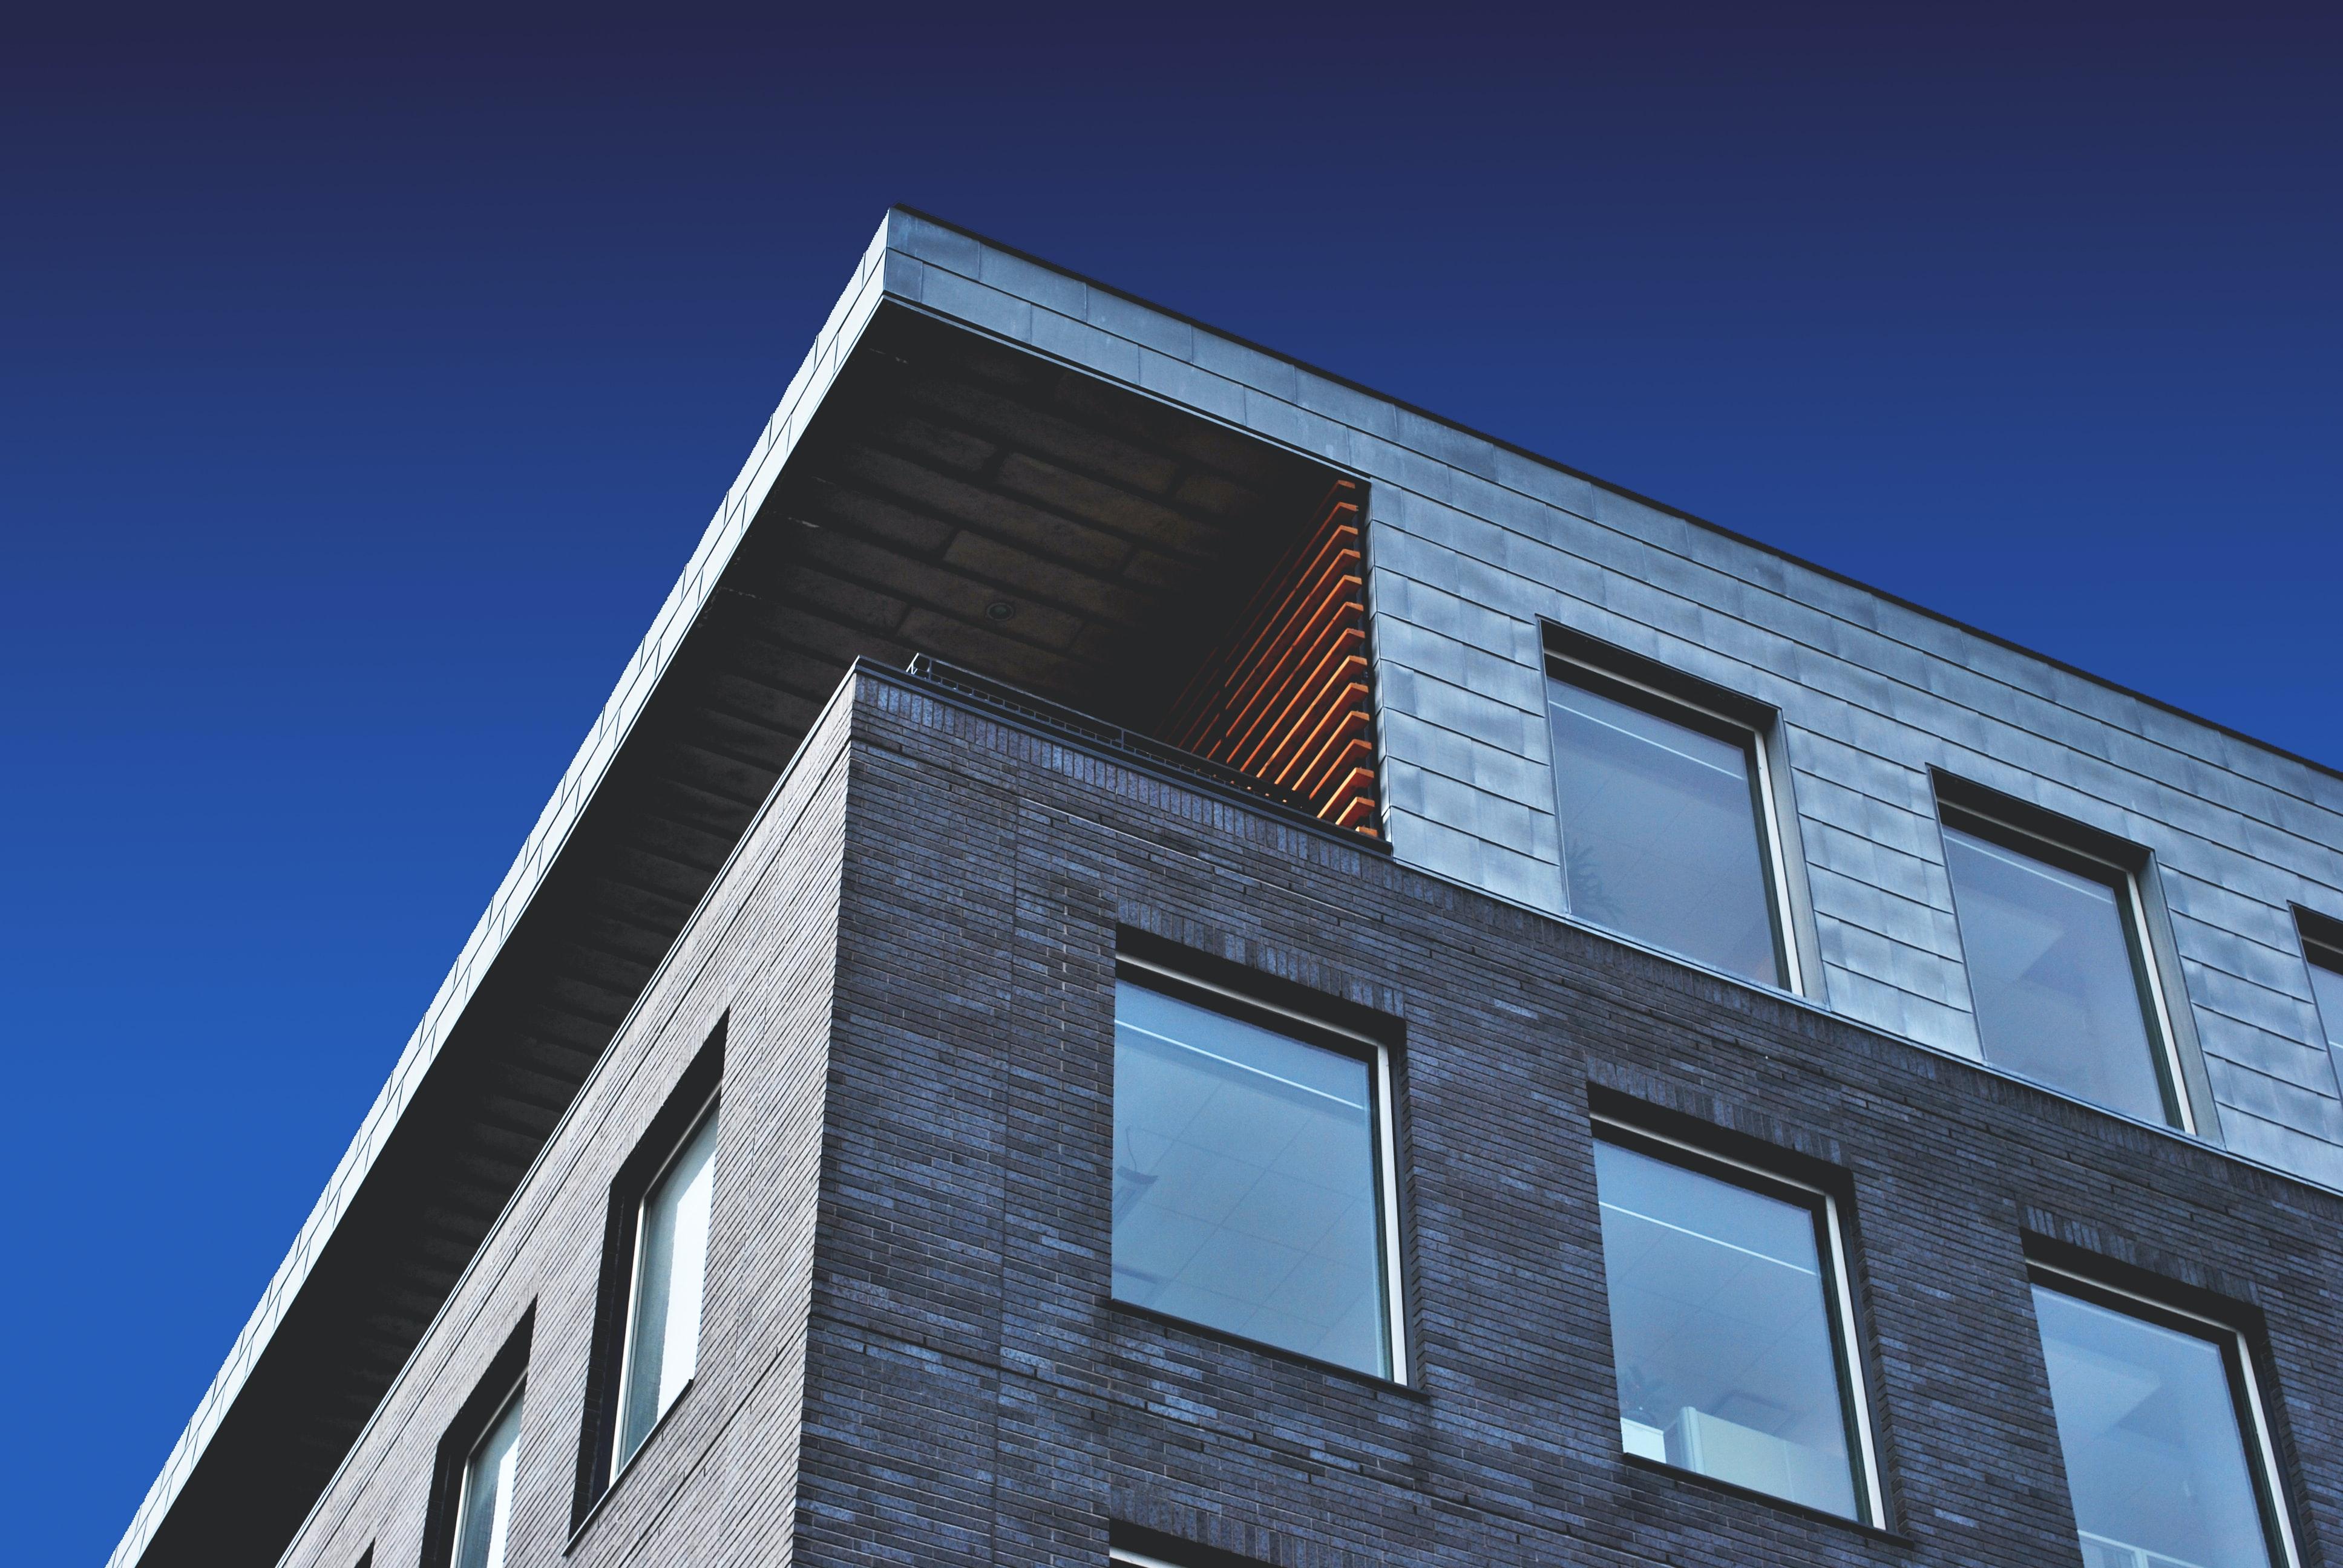 Building Exterior on blue sky